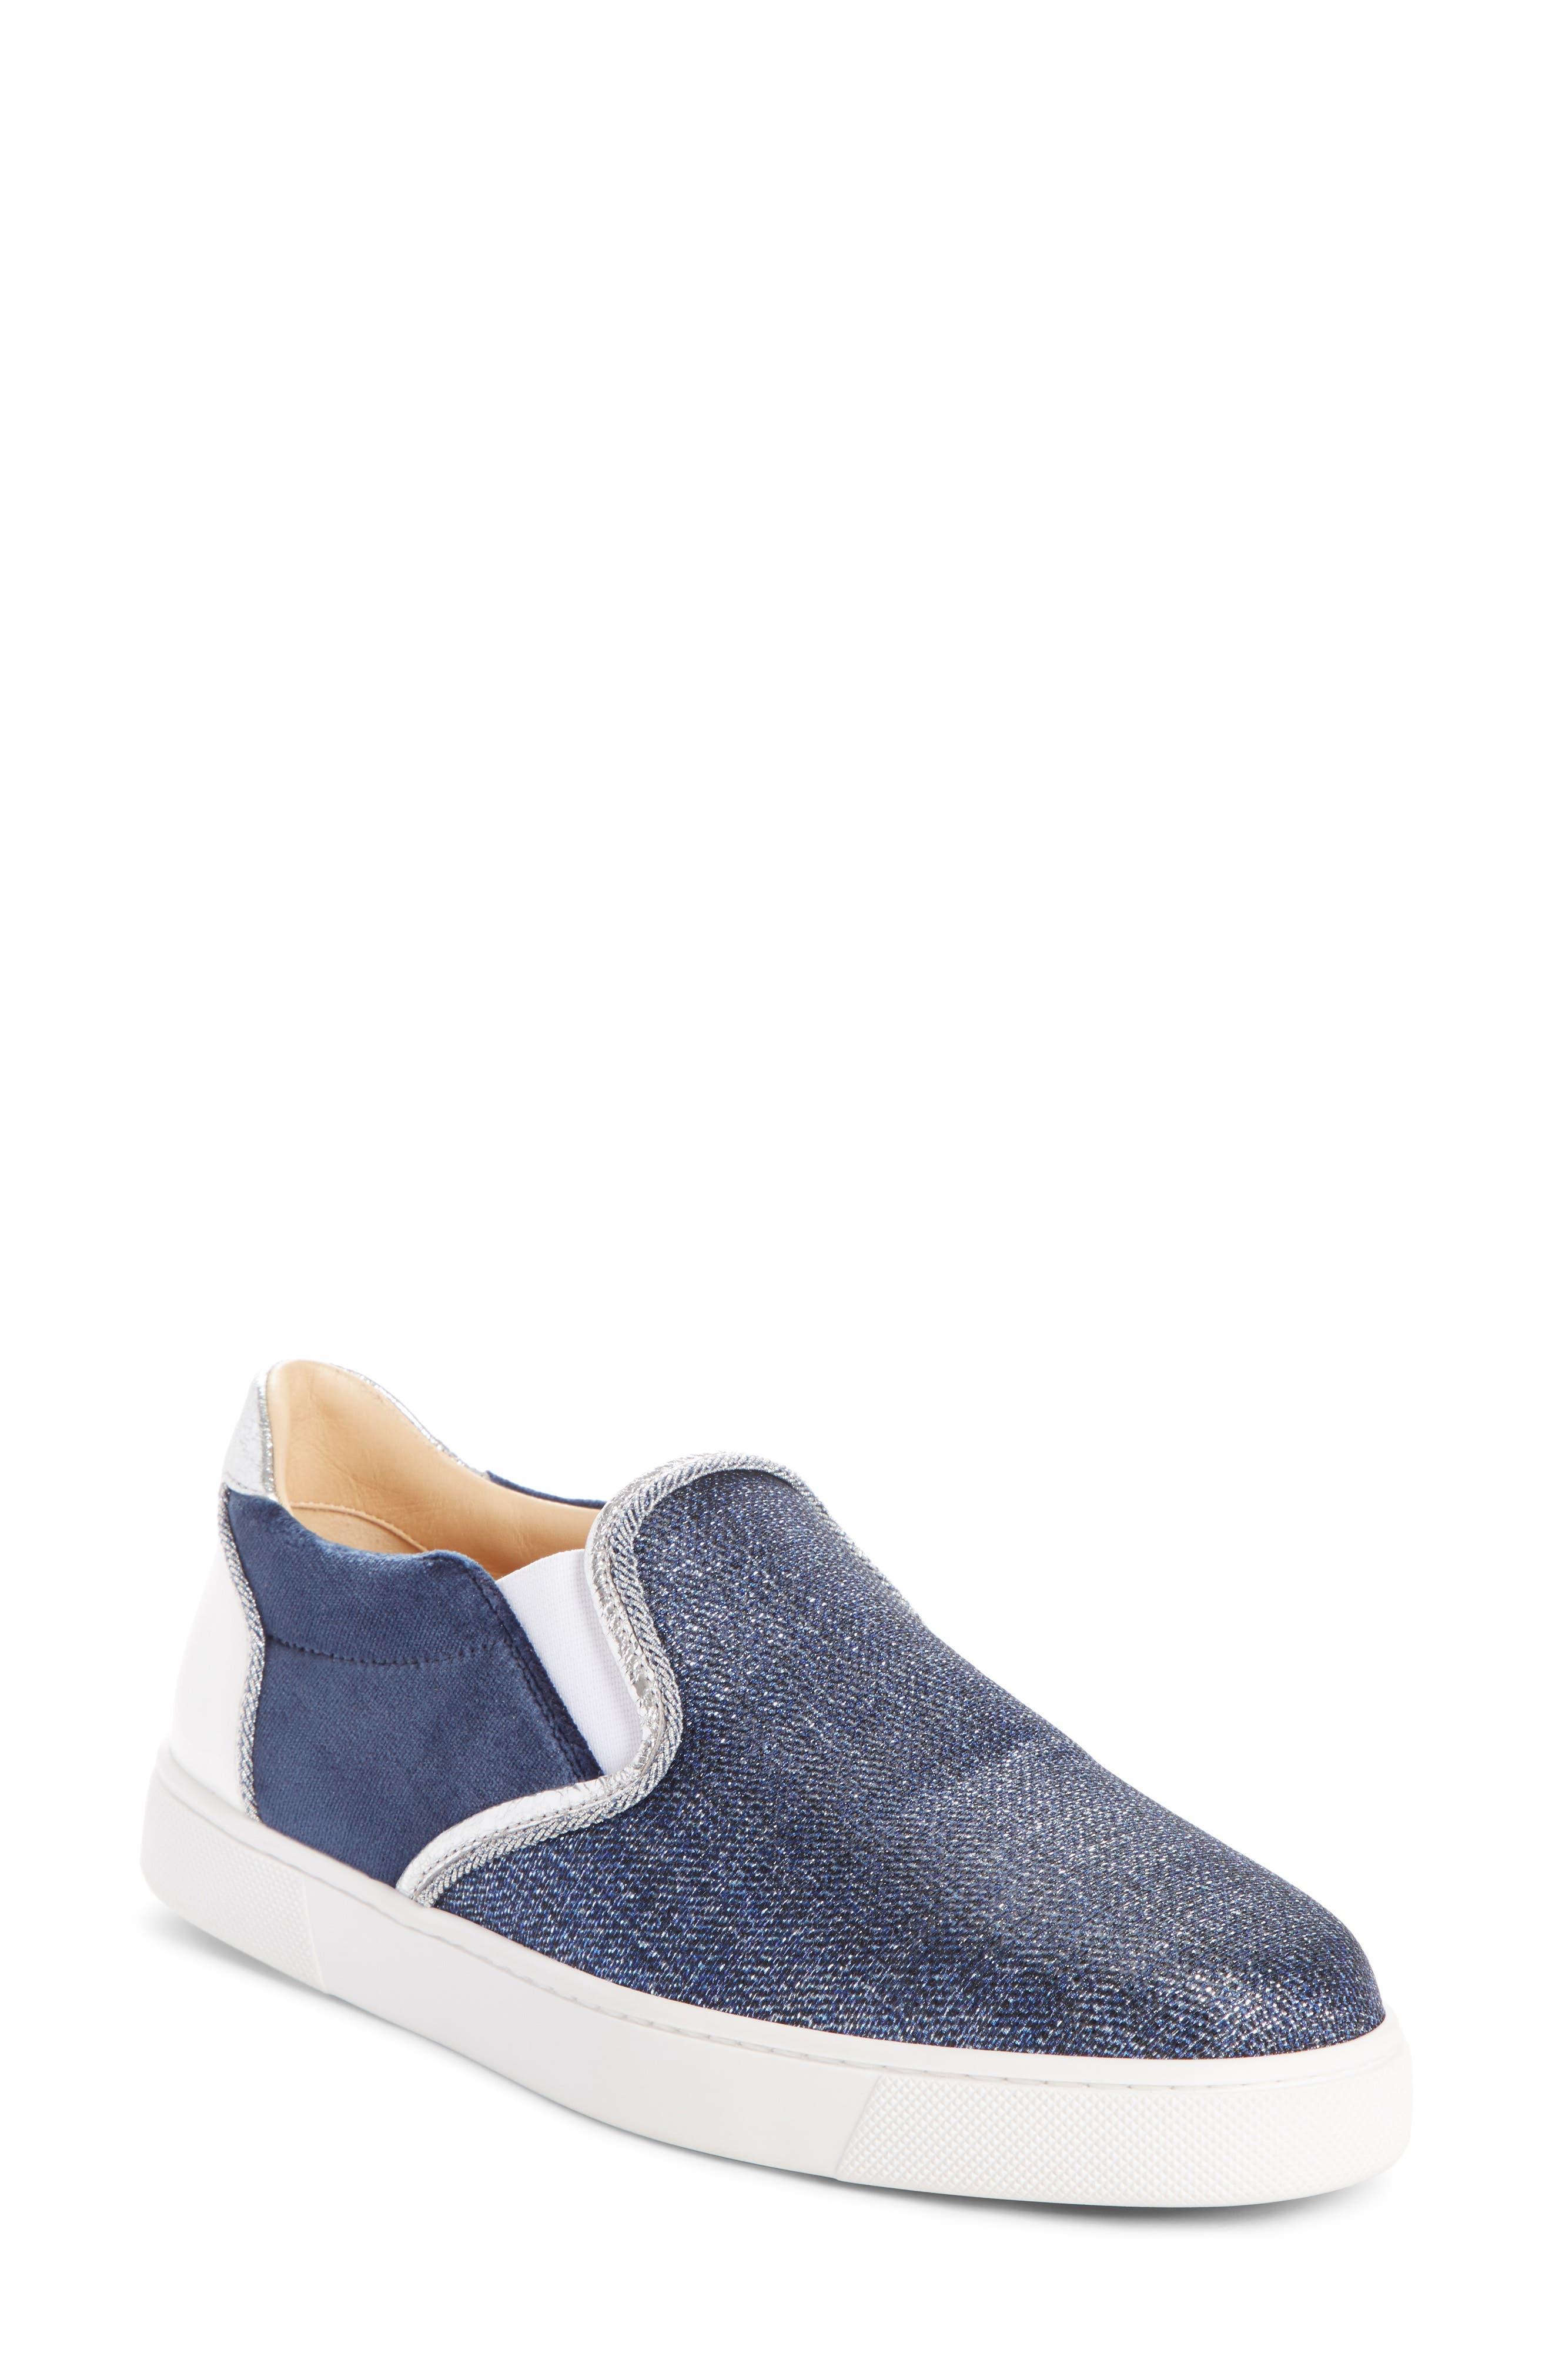 Masteralta Slip-On Sneaker,                         Main,                         color, 400